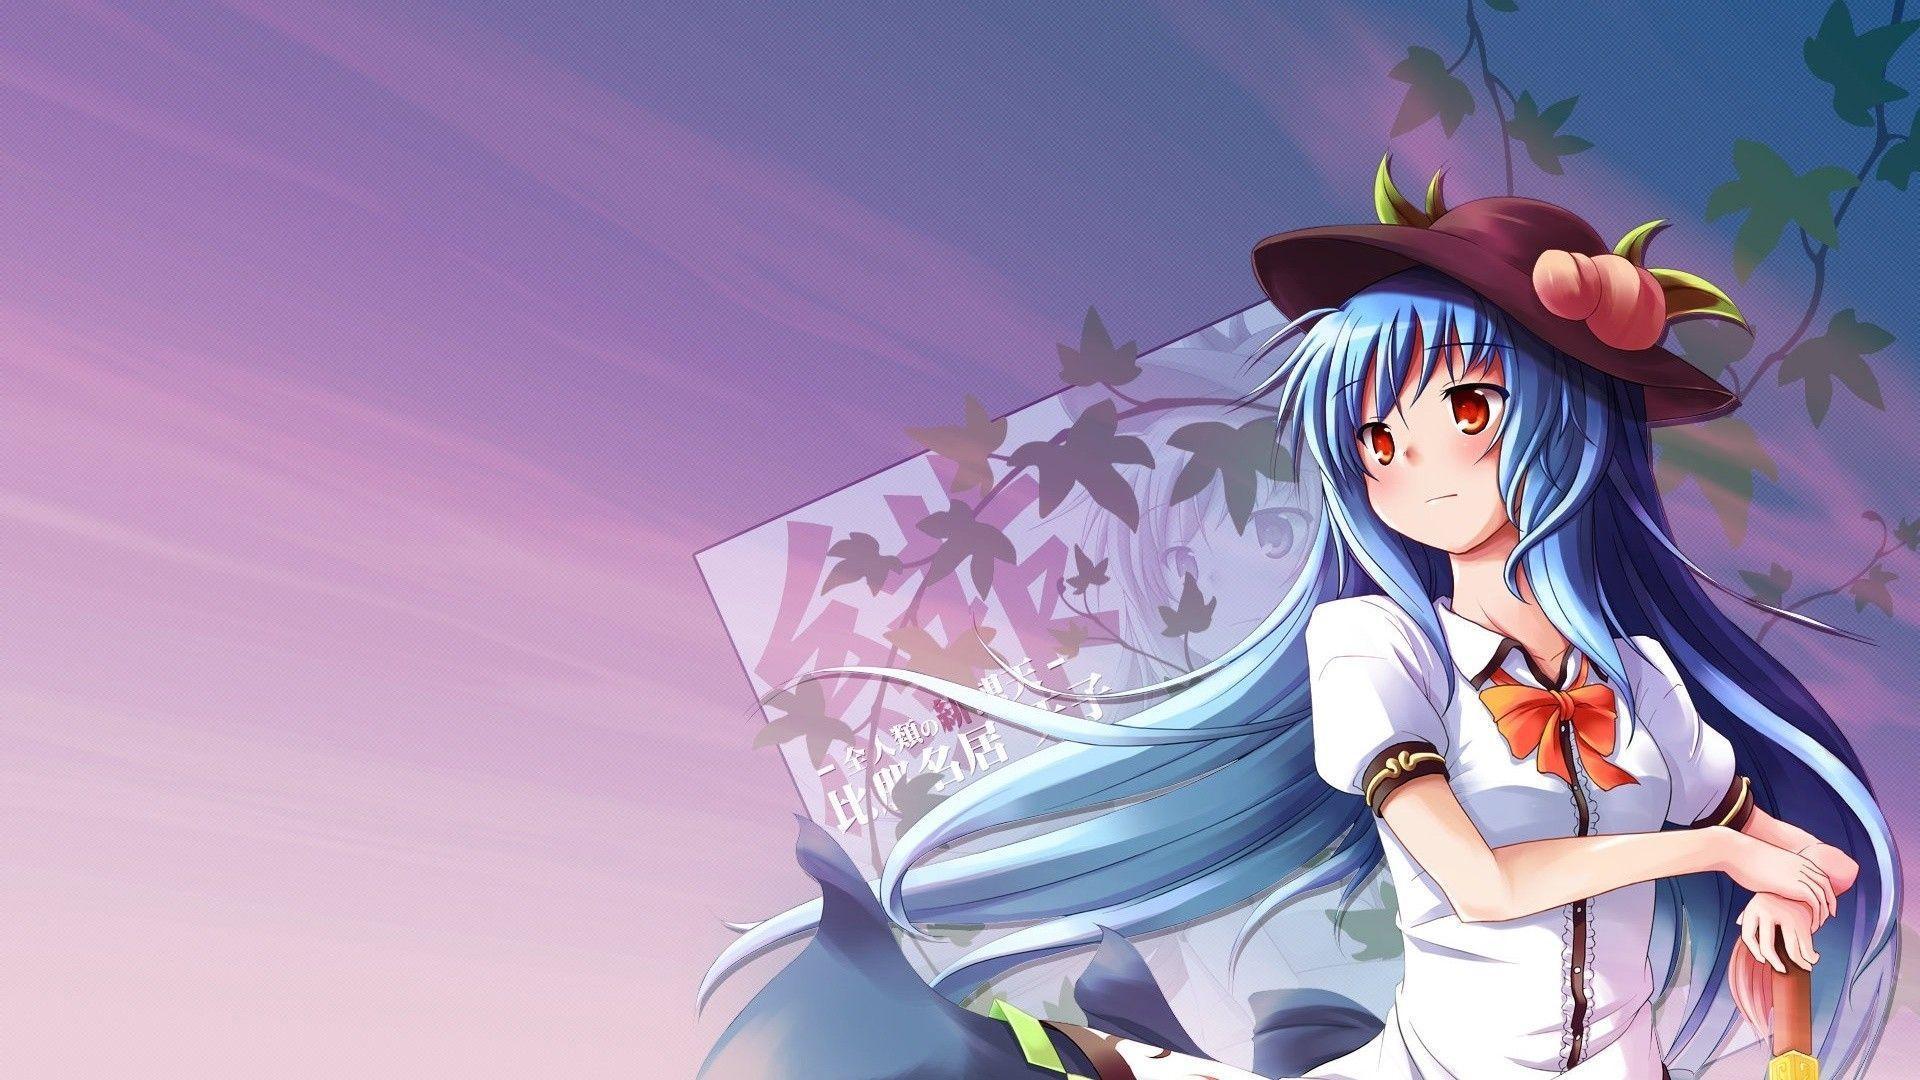 3d anime wallpapers wallpaper cave - 3d anime wallpaper ...